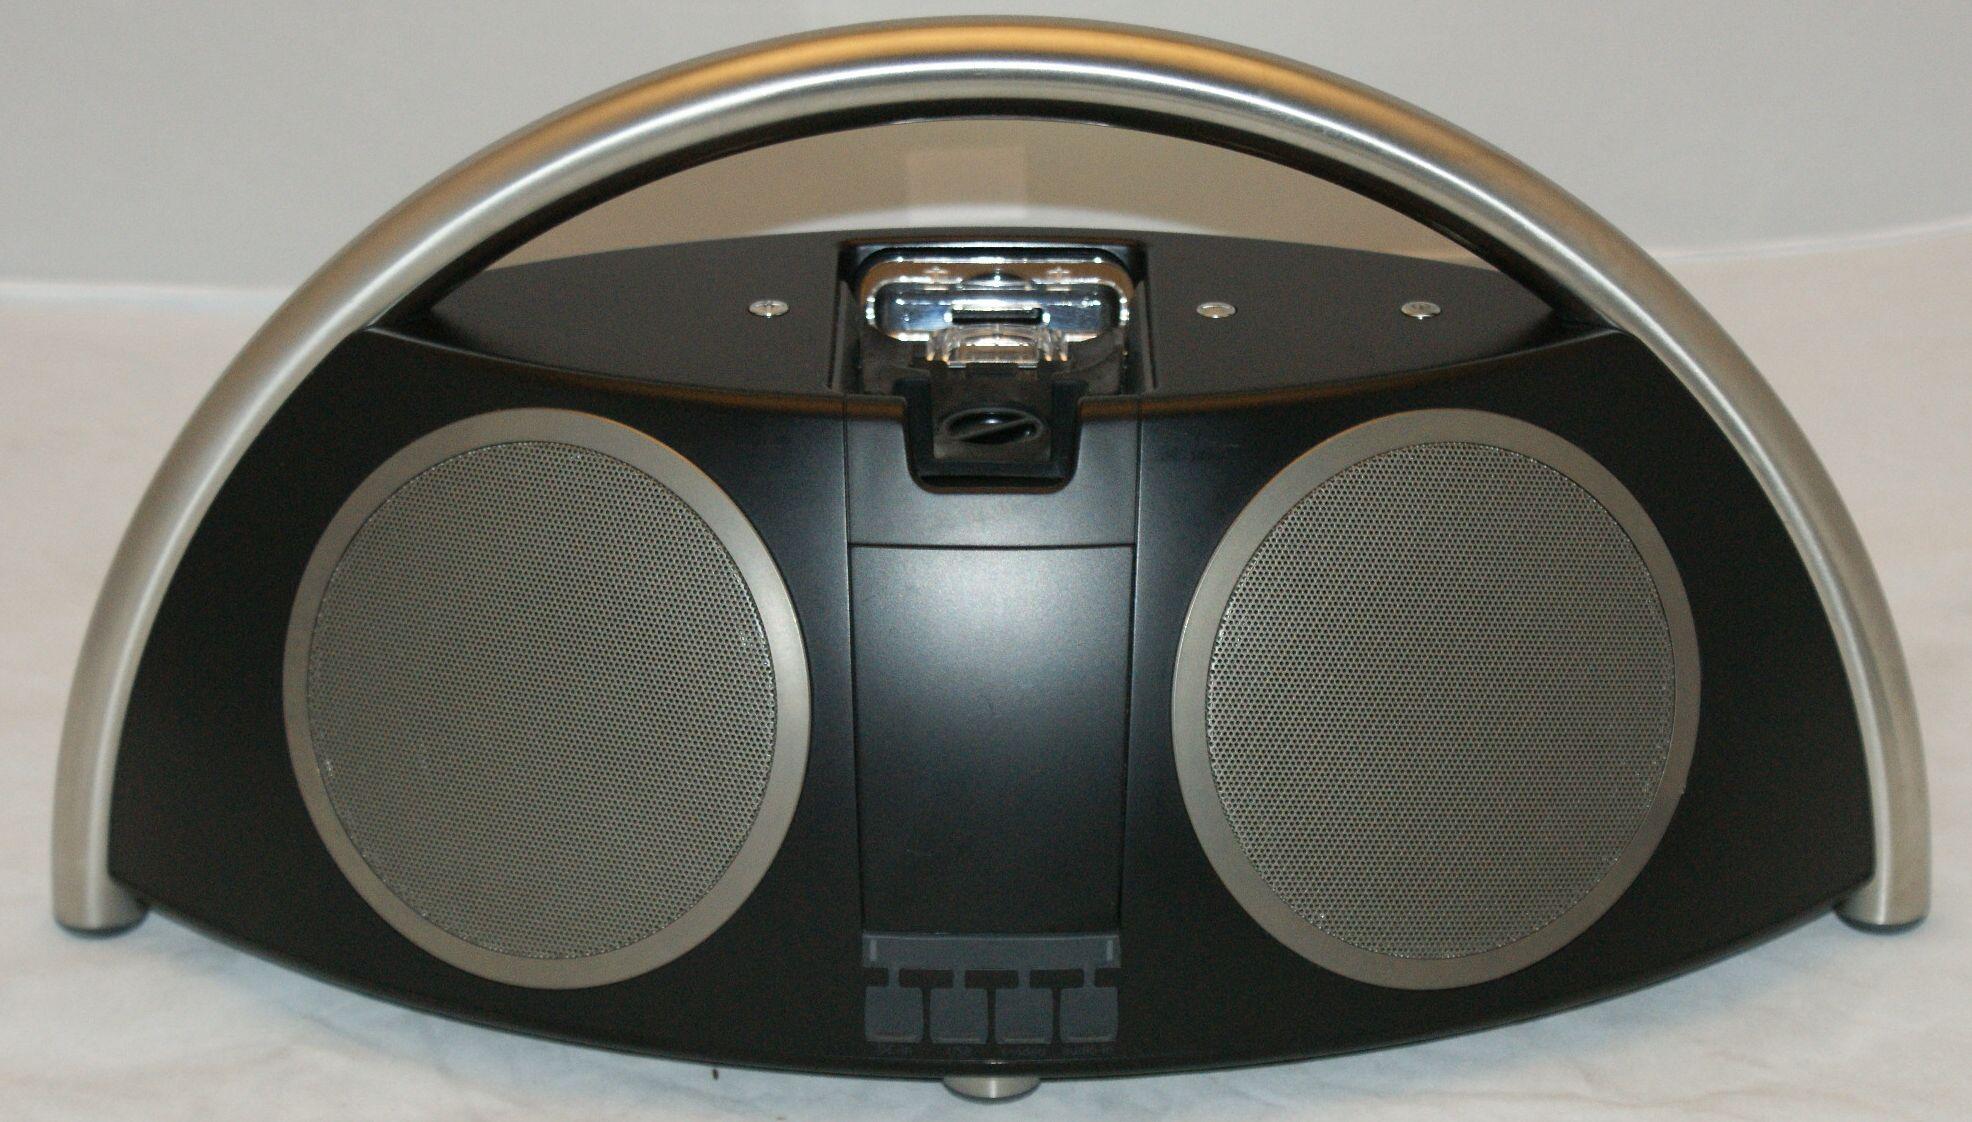 harman kardon go play ii tragbarer high end lautsprecher. Black Bedroom Furniture Sets. Home Design Ideas